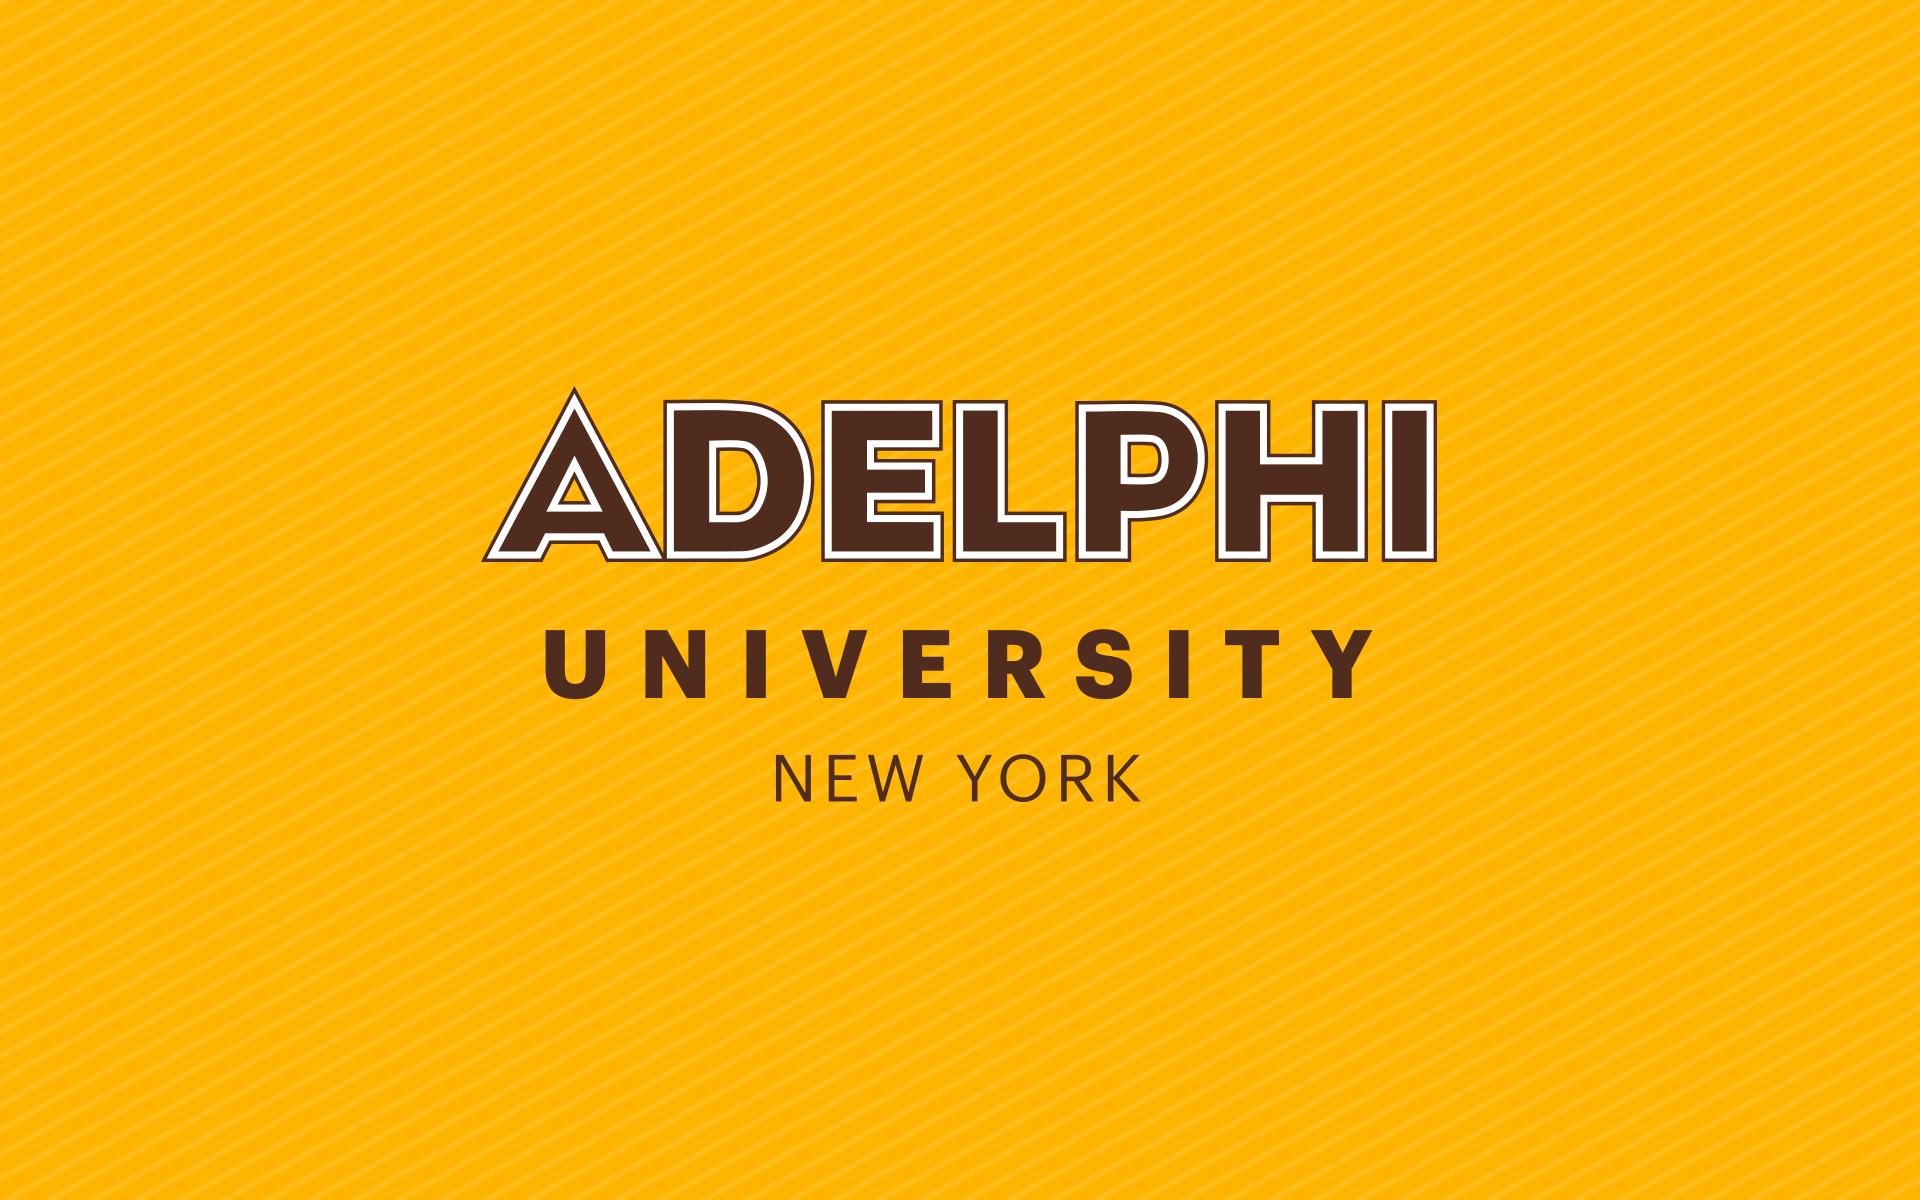 Desktop 16x10 - Adelphi Gold Wallpaper